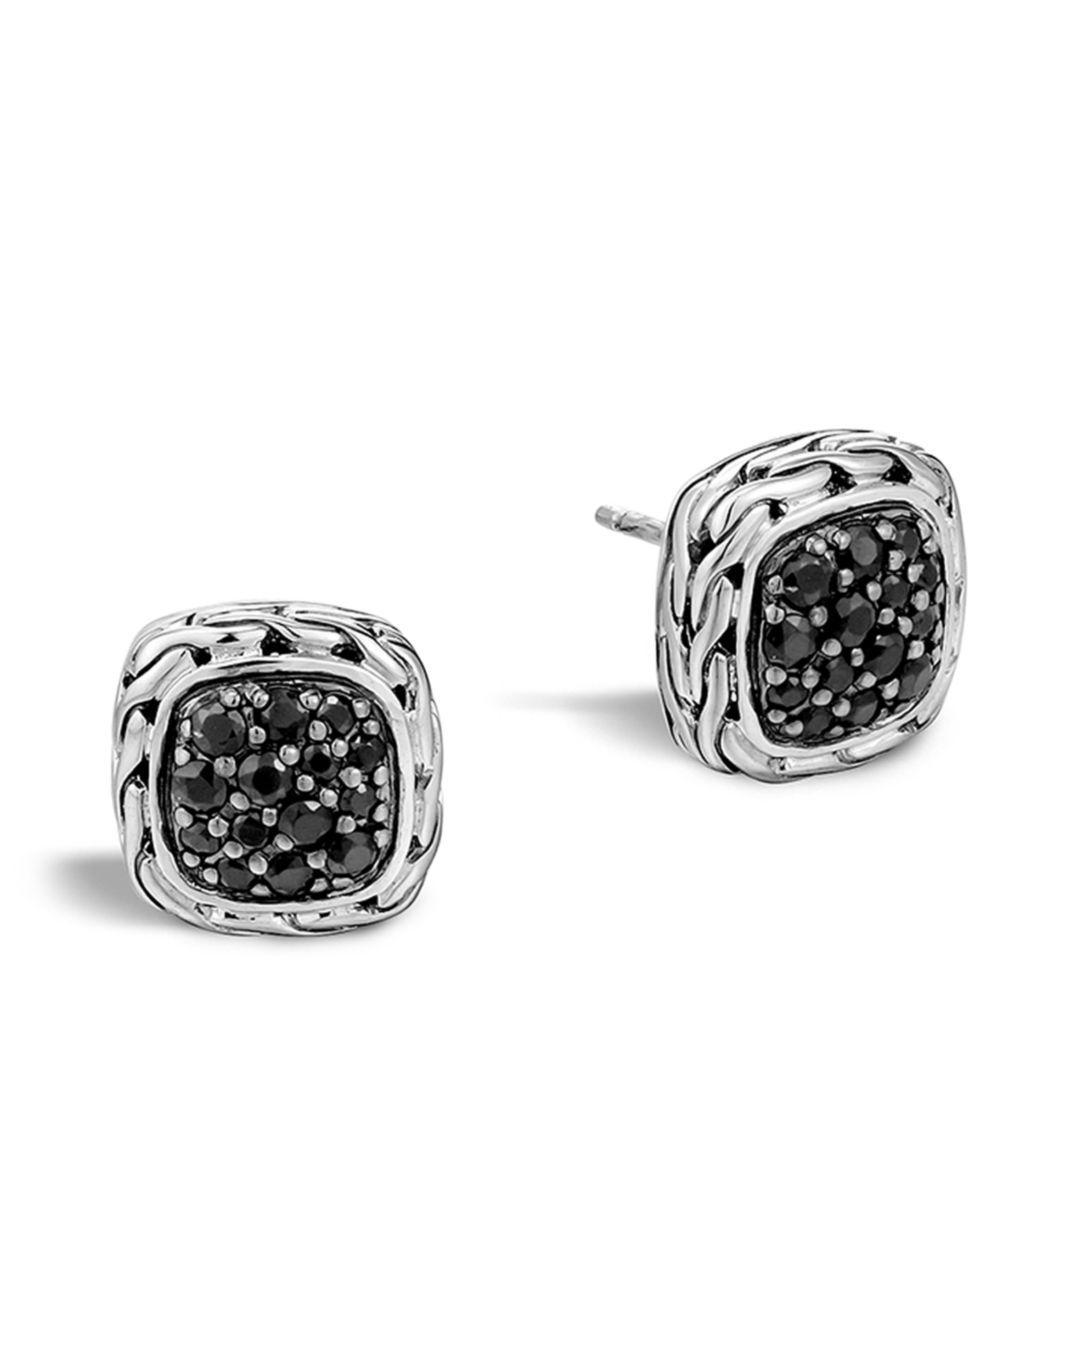 d80df28a4 John Hardy 'classic Chain' Small Square Stud Earrings in Metallic - Lyst